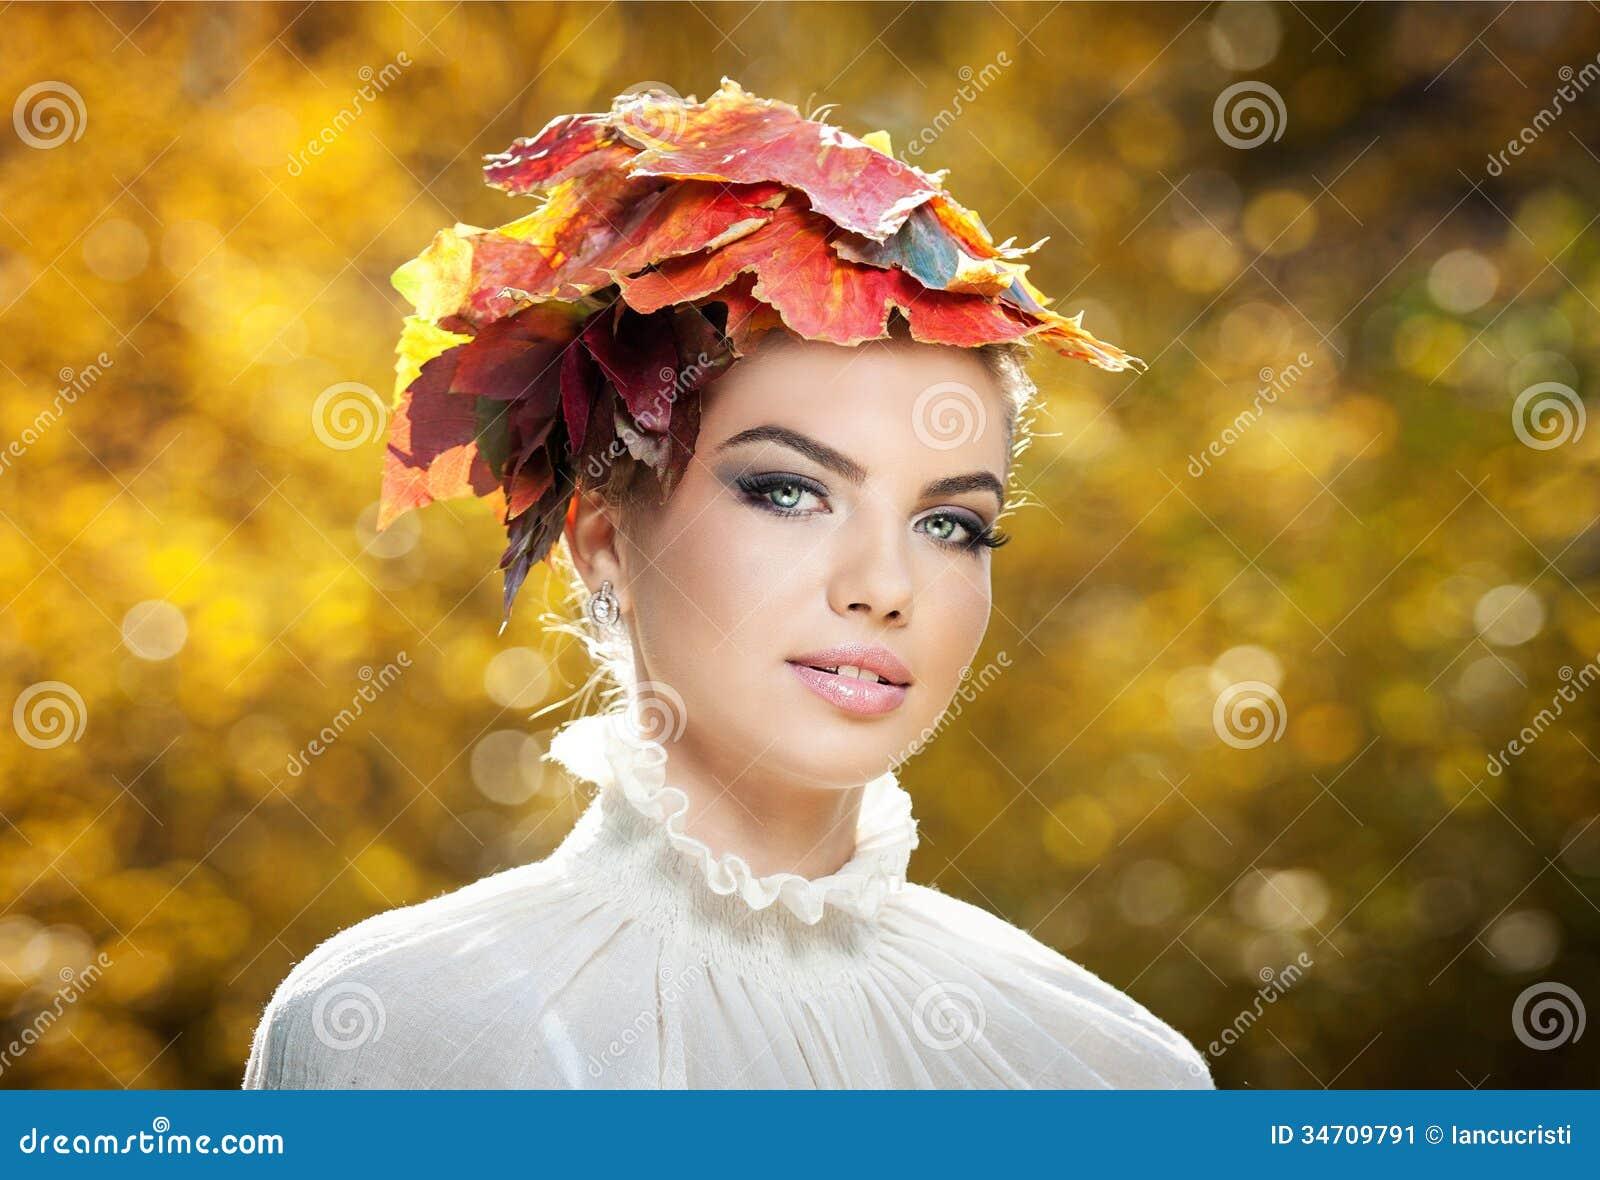 Autumn Woman Beautiful Creative Makeup And Hair Style